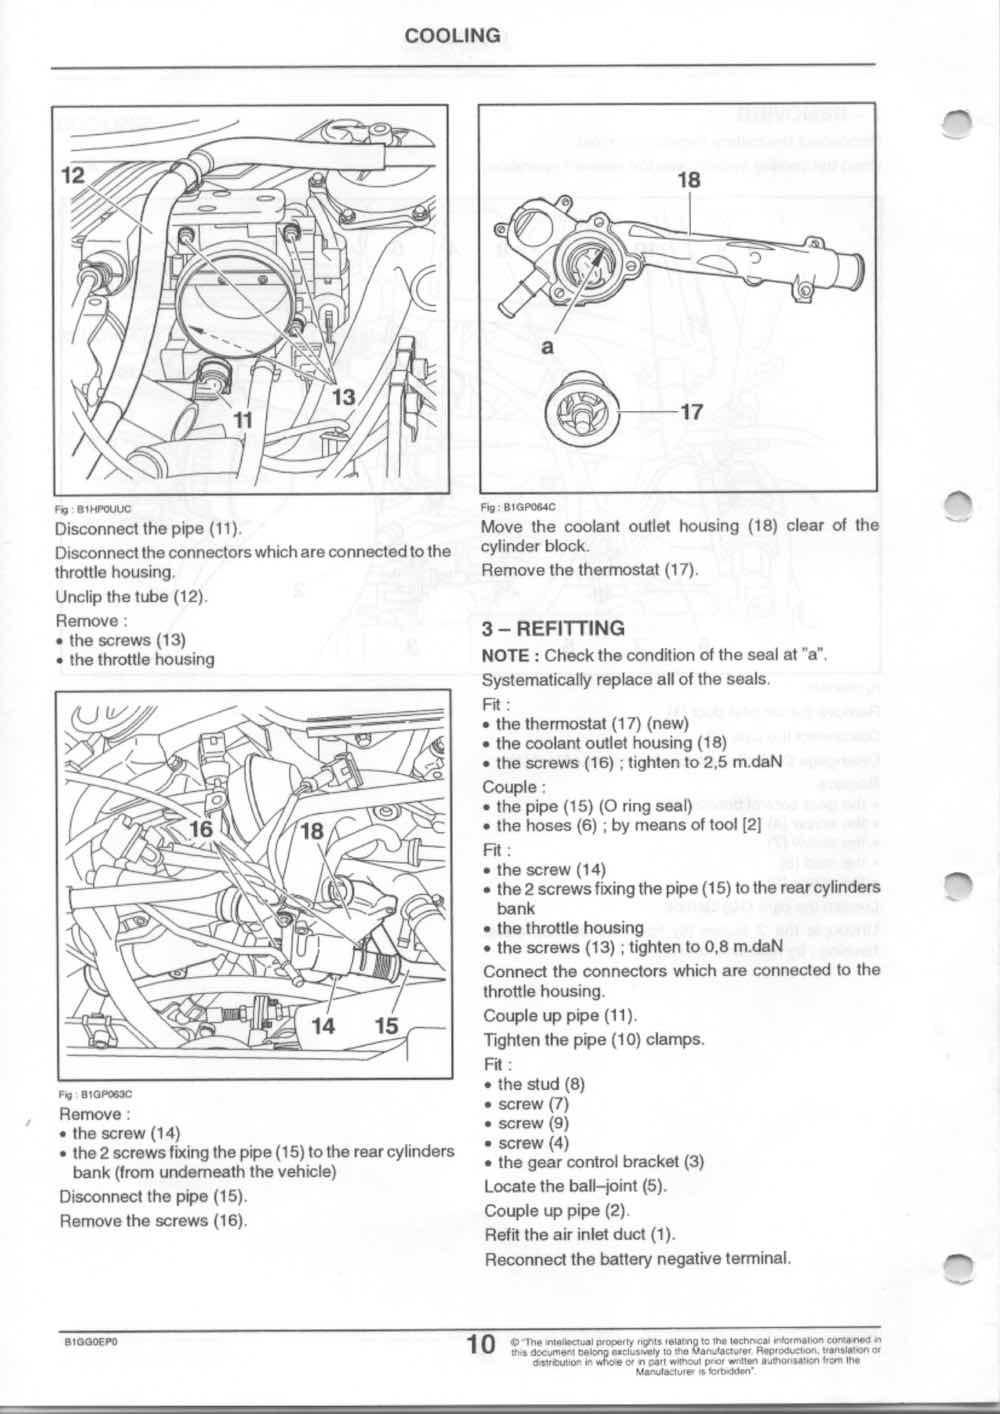 1_XM.230-00-5 thermostat.jpg